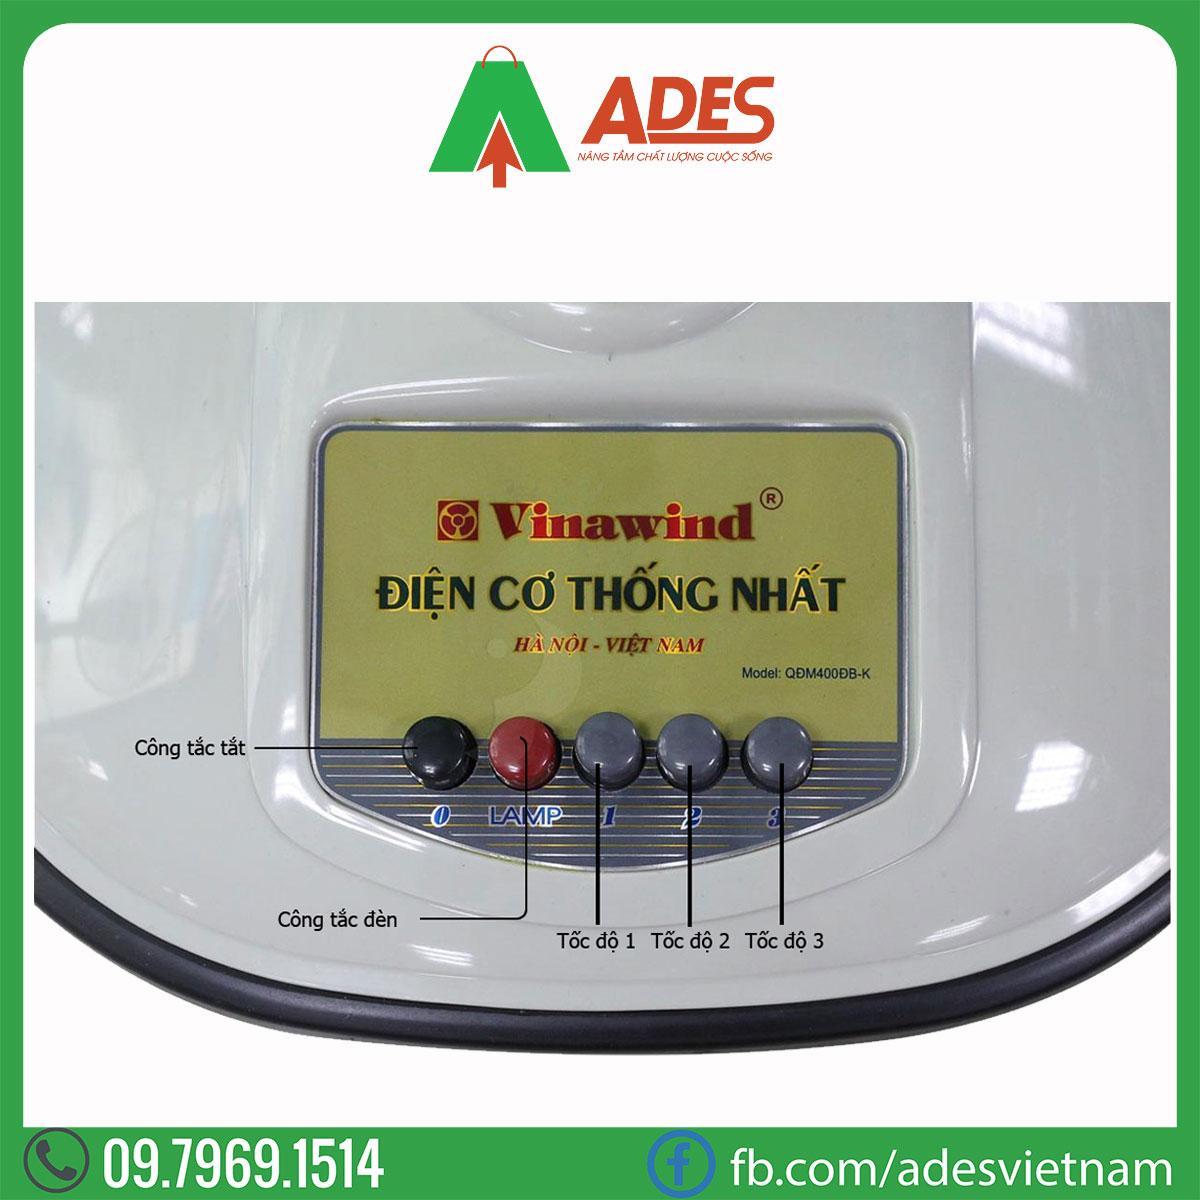 Quat dung mini Vinawind QDM 400 DB-K Dien may ADES